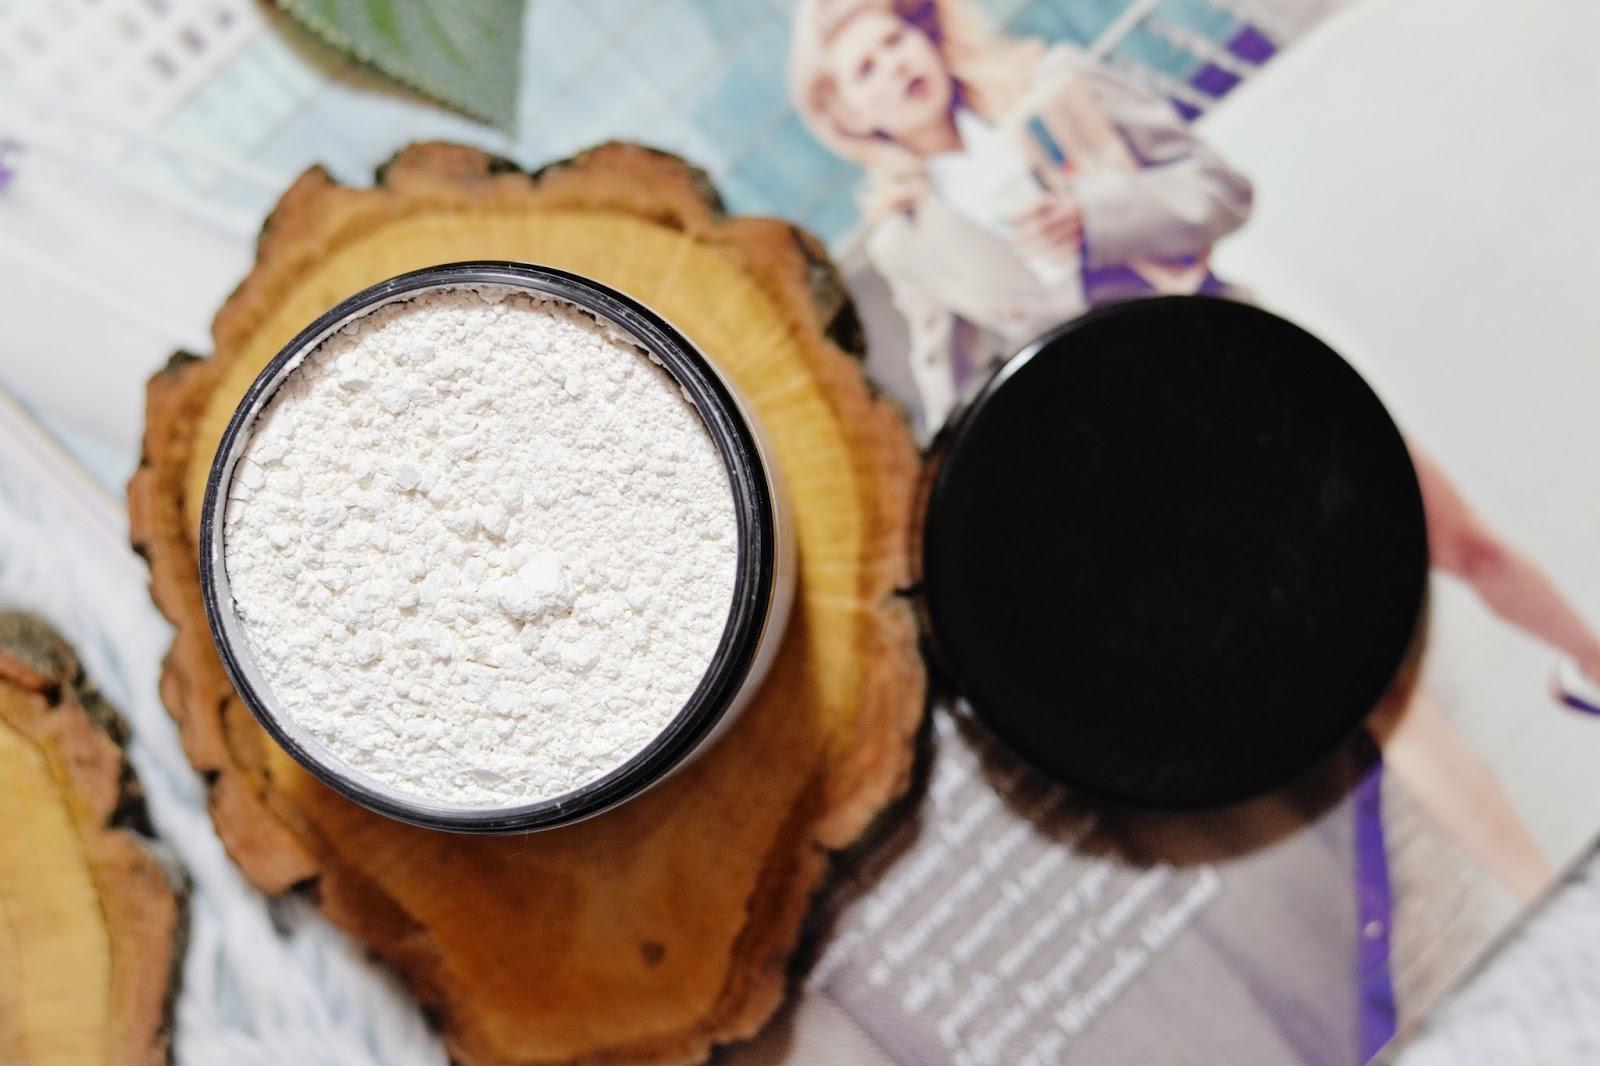 glinka kosmetyki naturalne